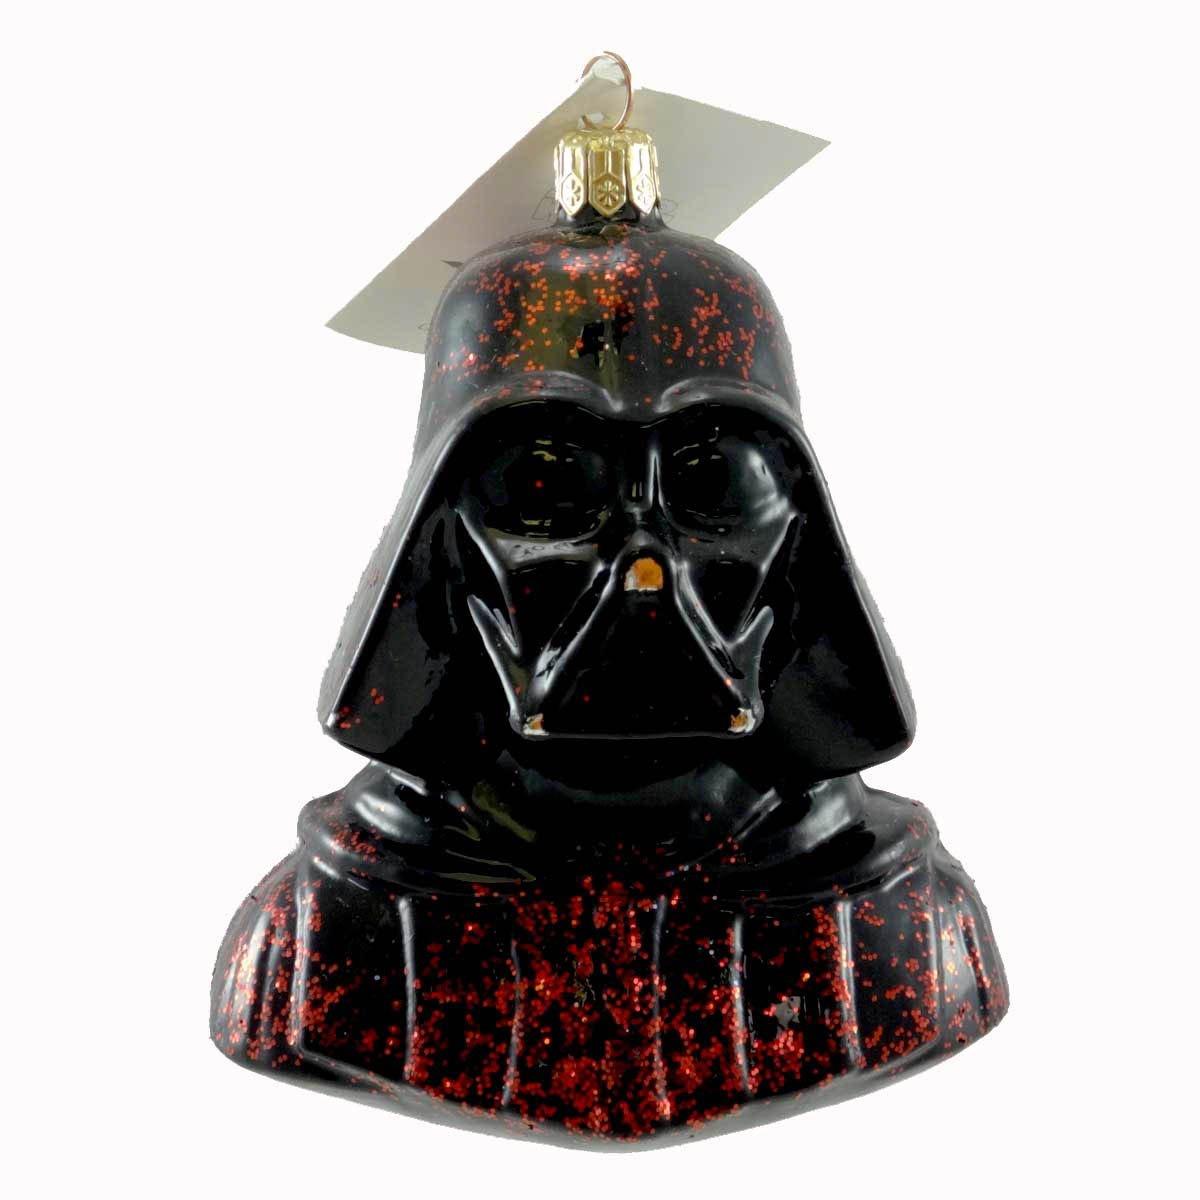 Radko Glass Ornament of Darth Vader